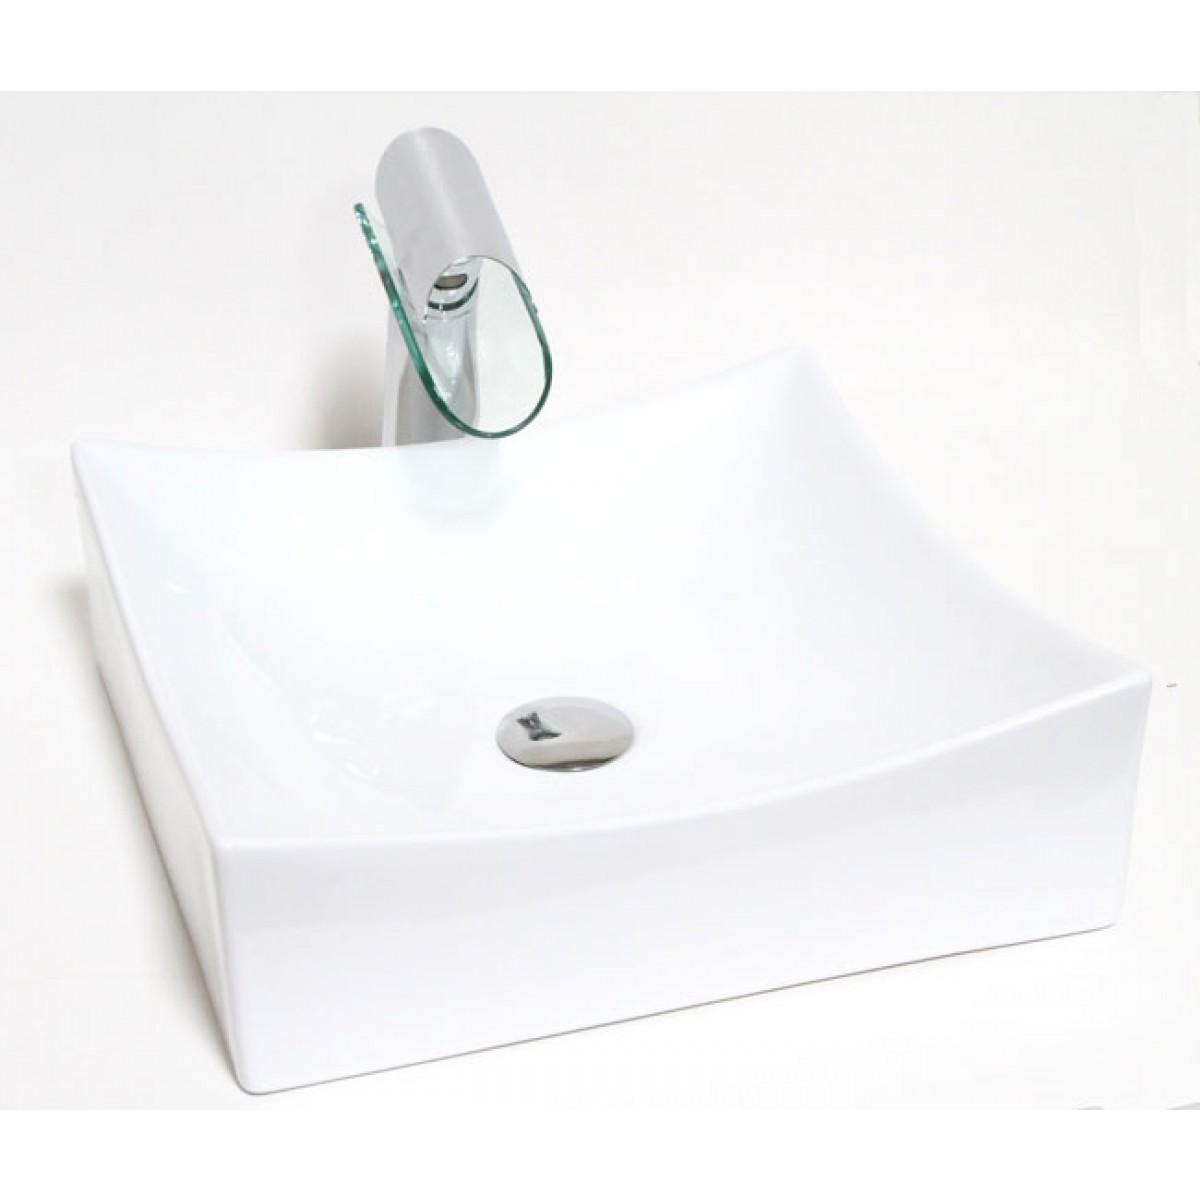 European Style Square Porcelain Ceramic Countertop Bathroom Vessel Sink 15 1 2 X 5 Inch